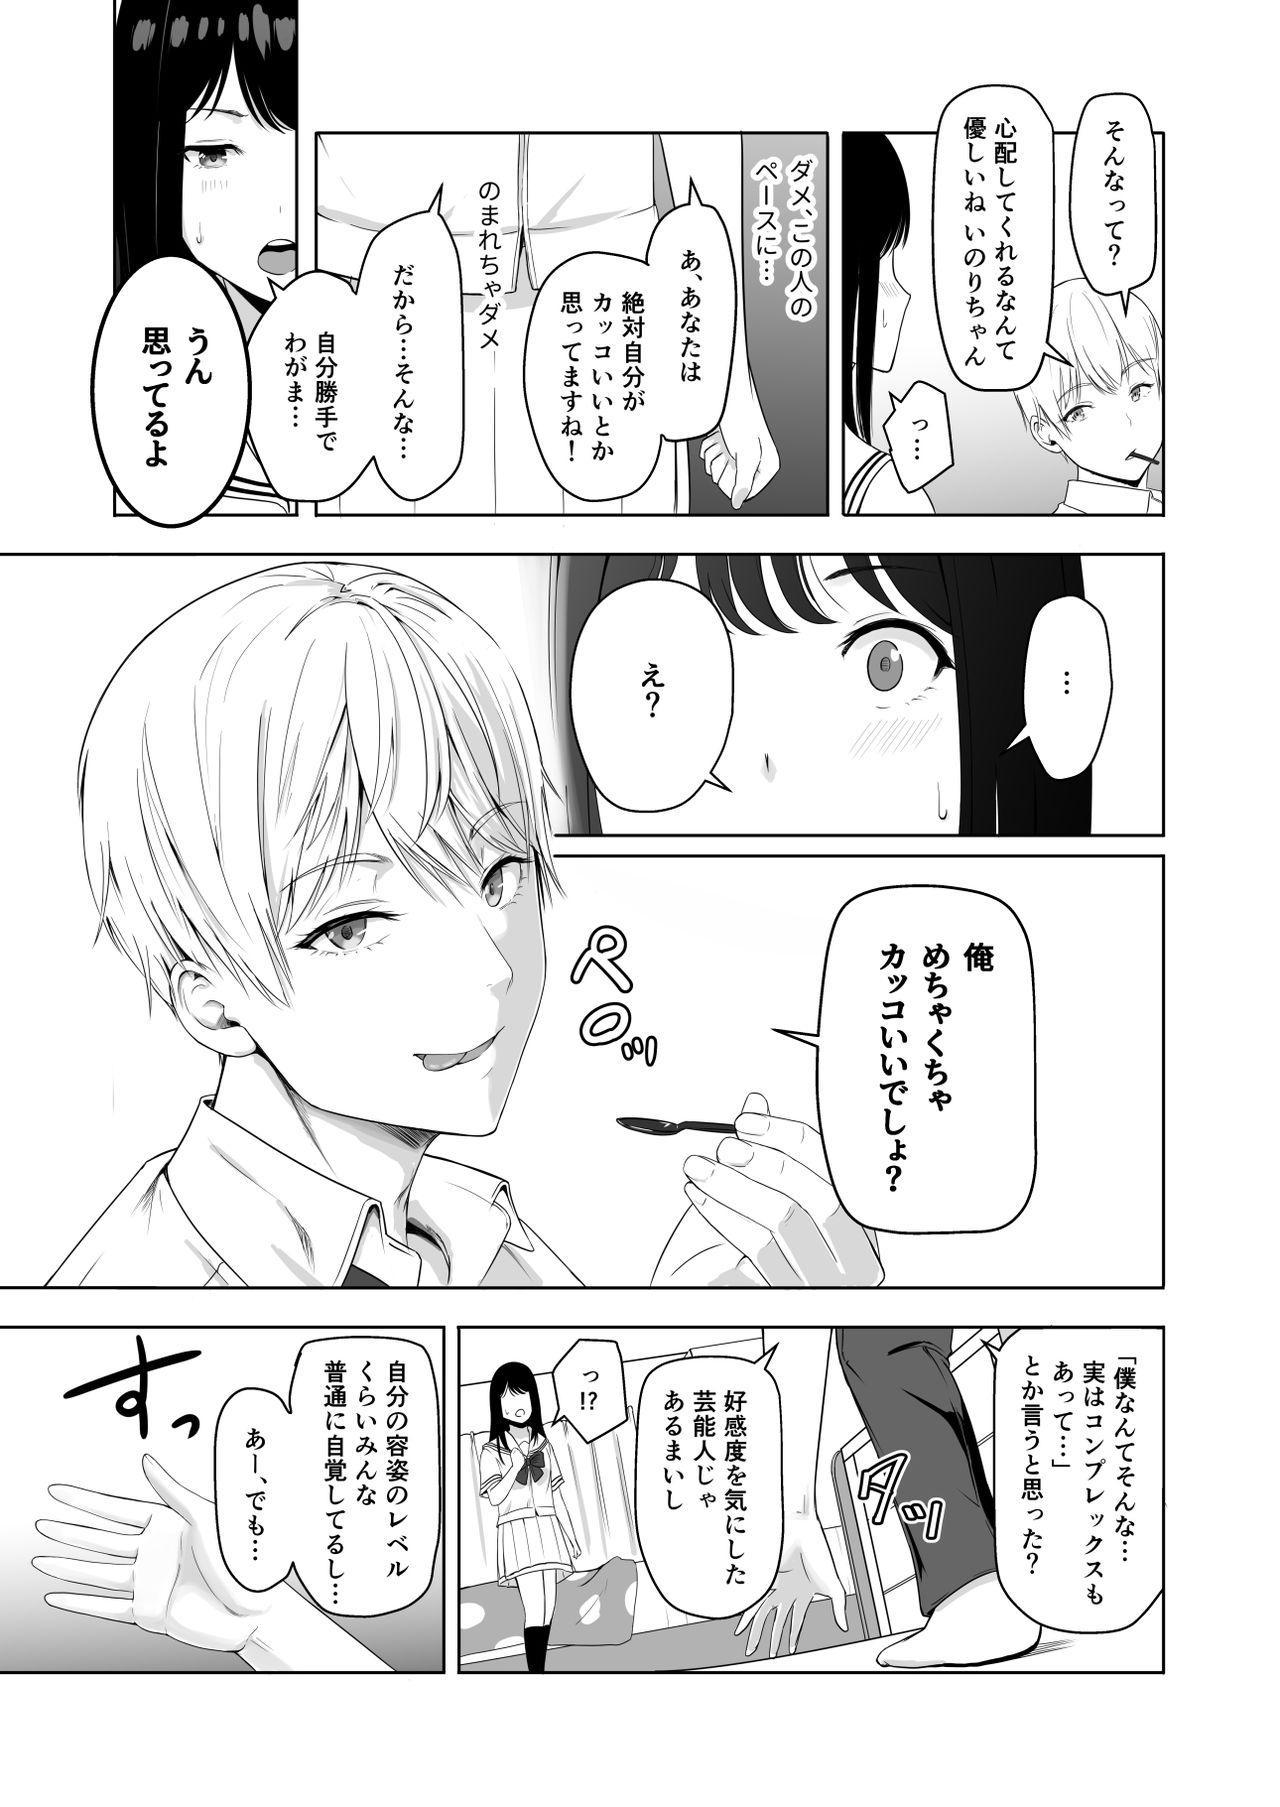 Kimi ga Tame. 2 Ichikawa Inori 39